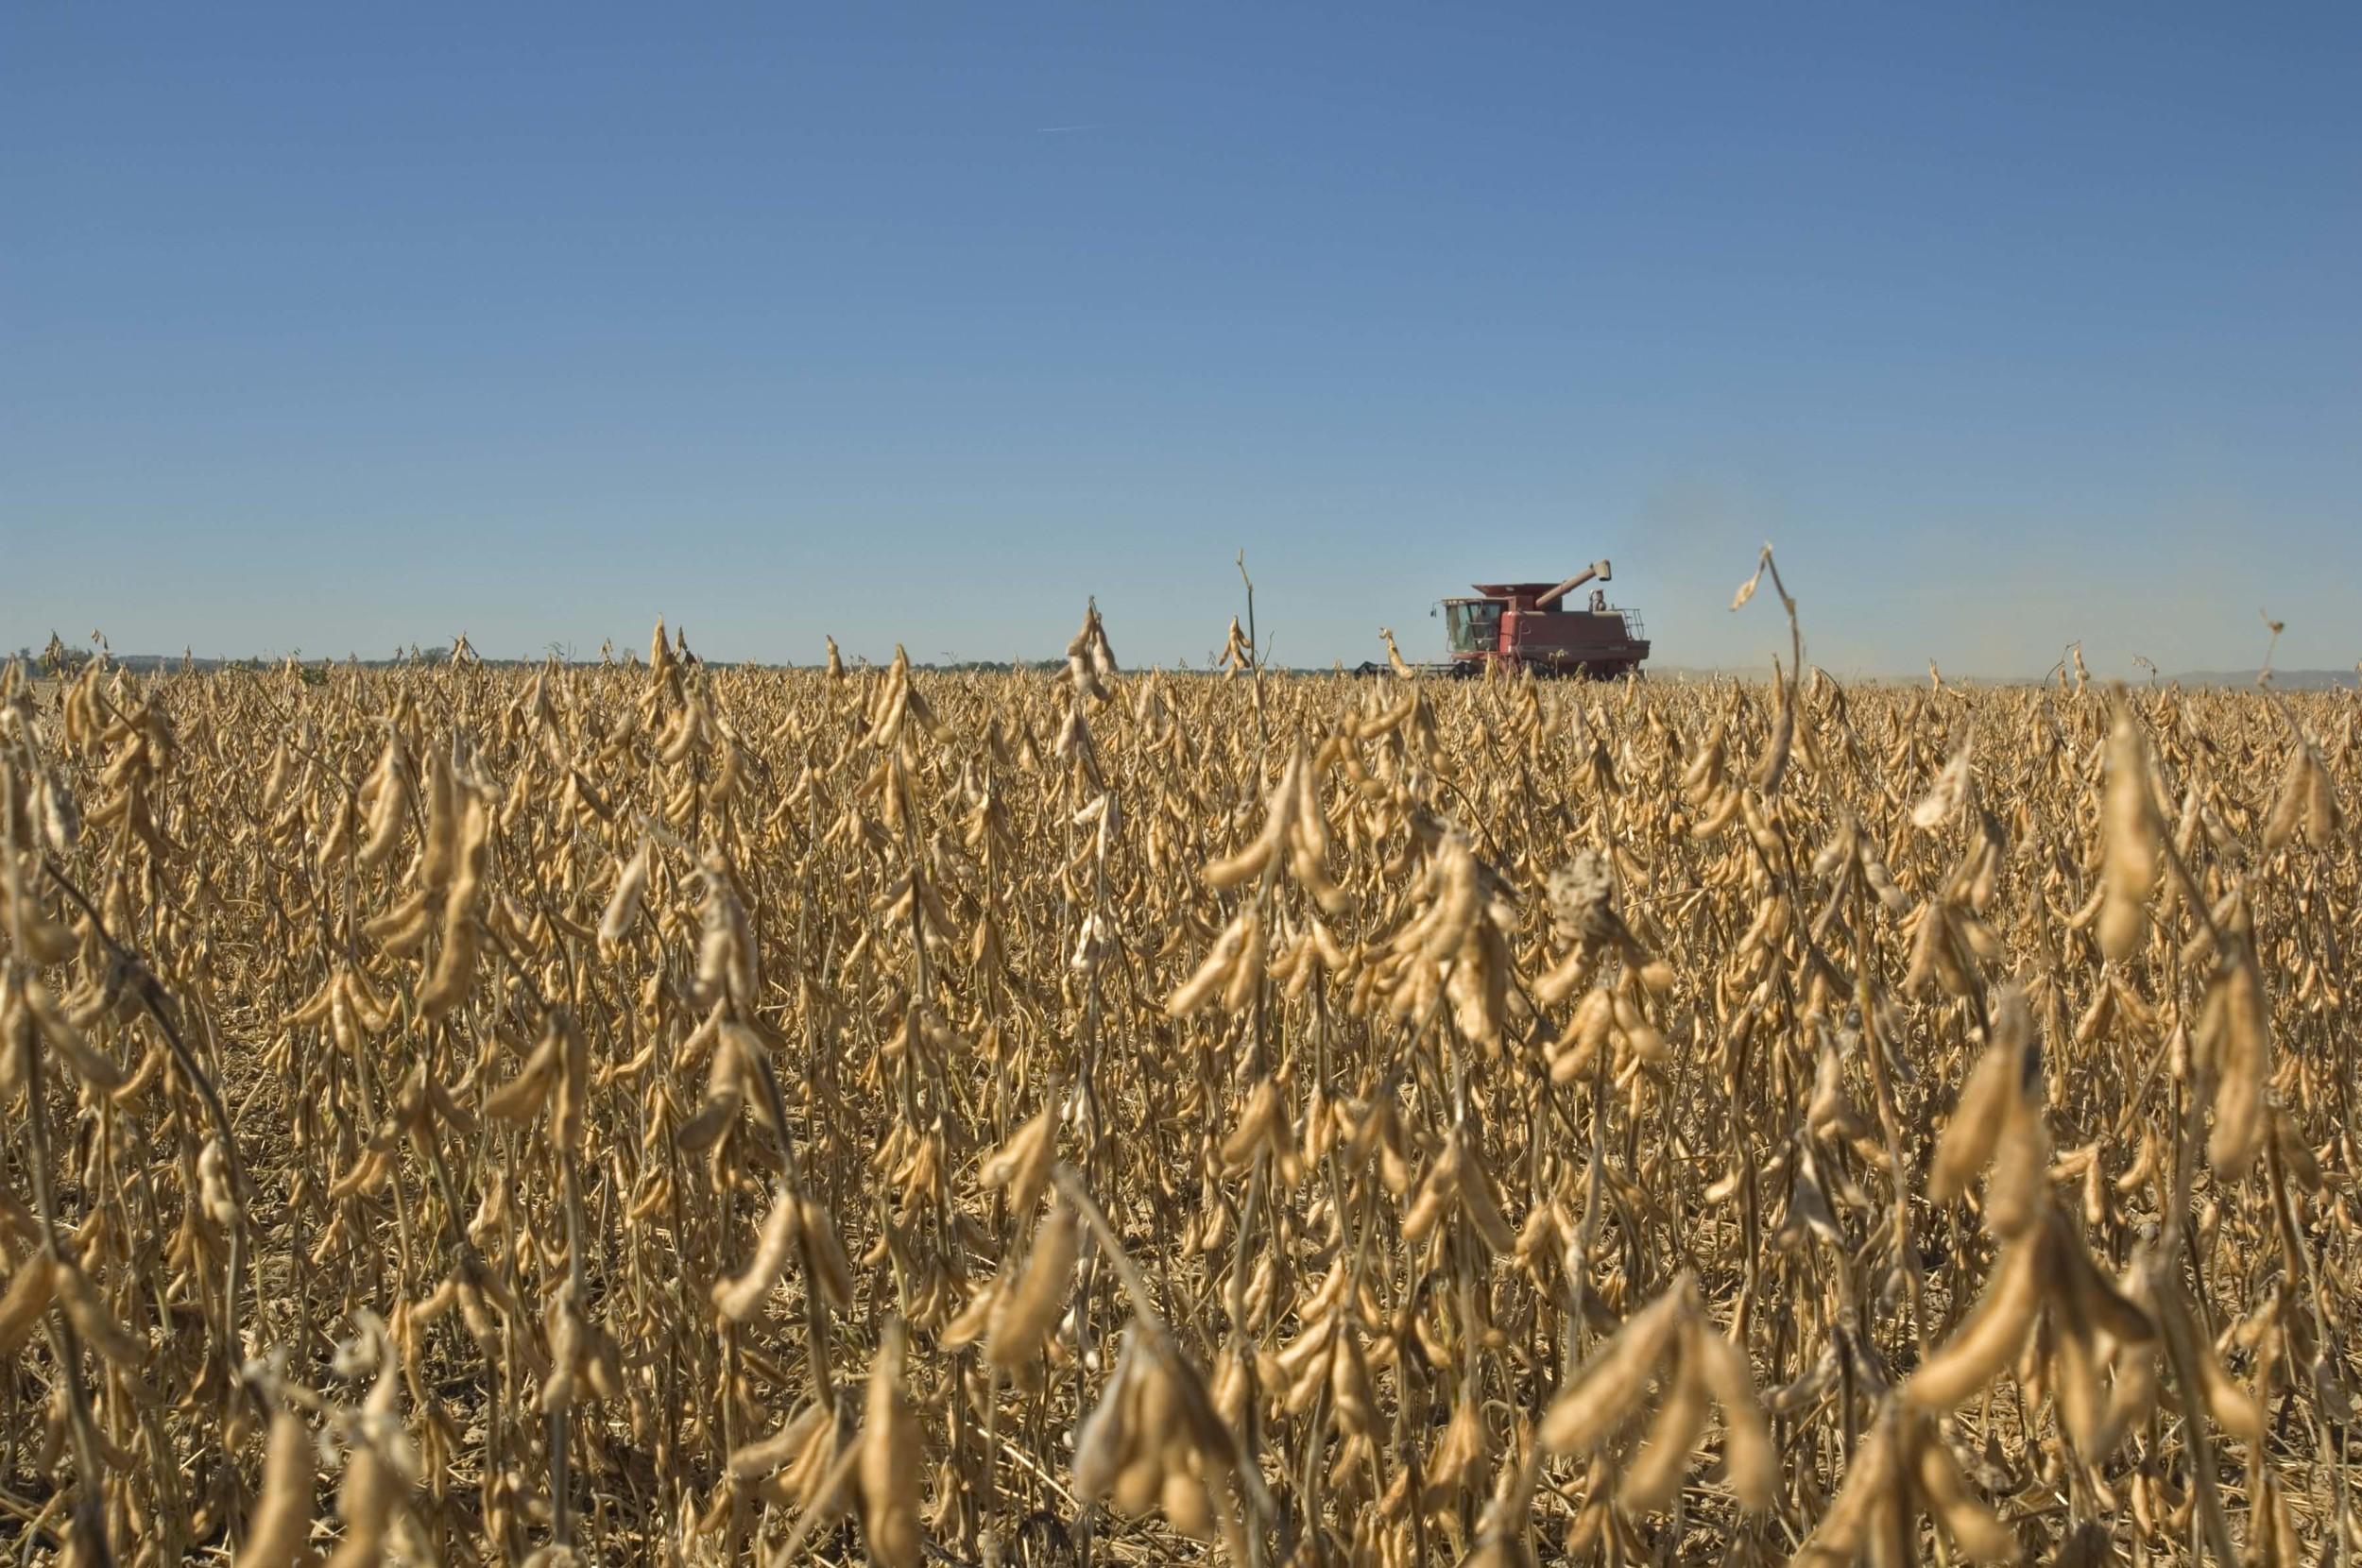 Photo: United soybean Board/Flickr